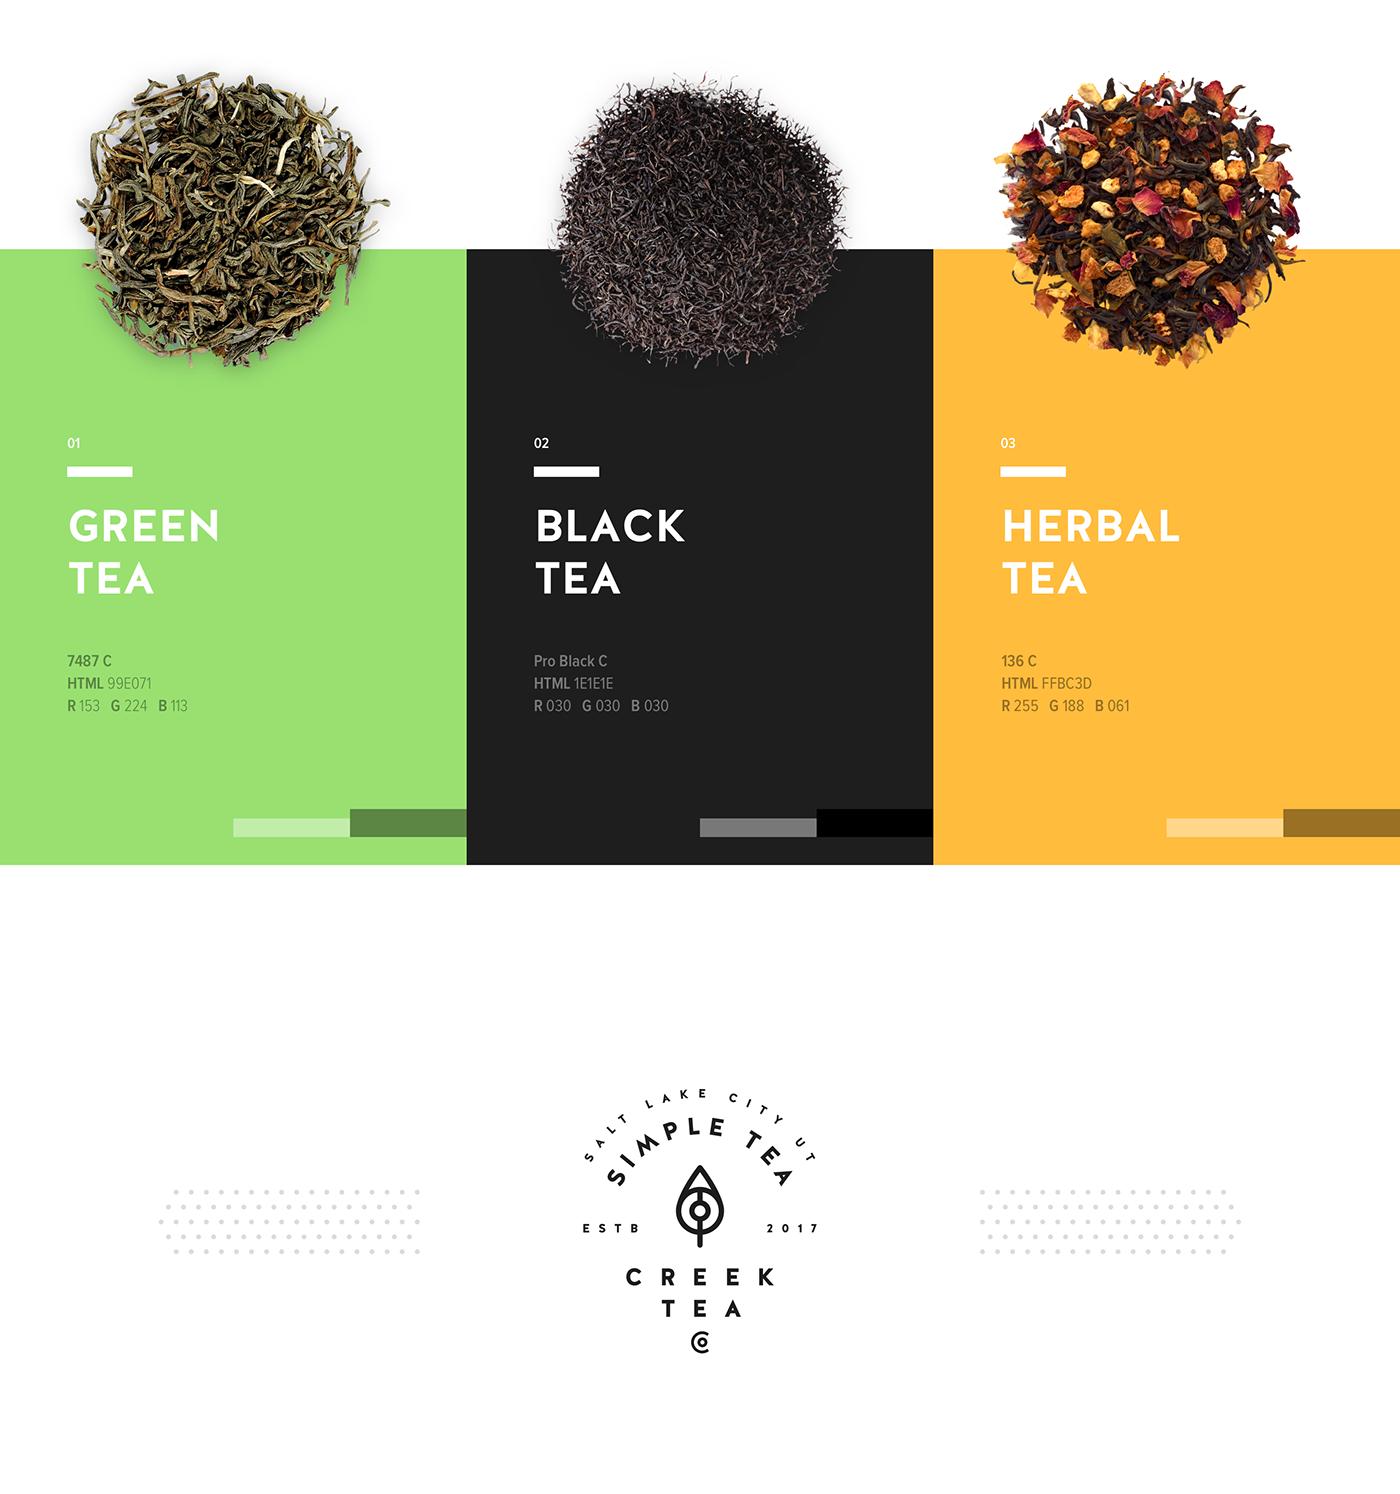 logo tea branding  design-by-diamond creek-tea-co package design  logomark brand-identity kettle tea-kettle